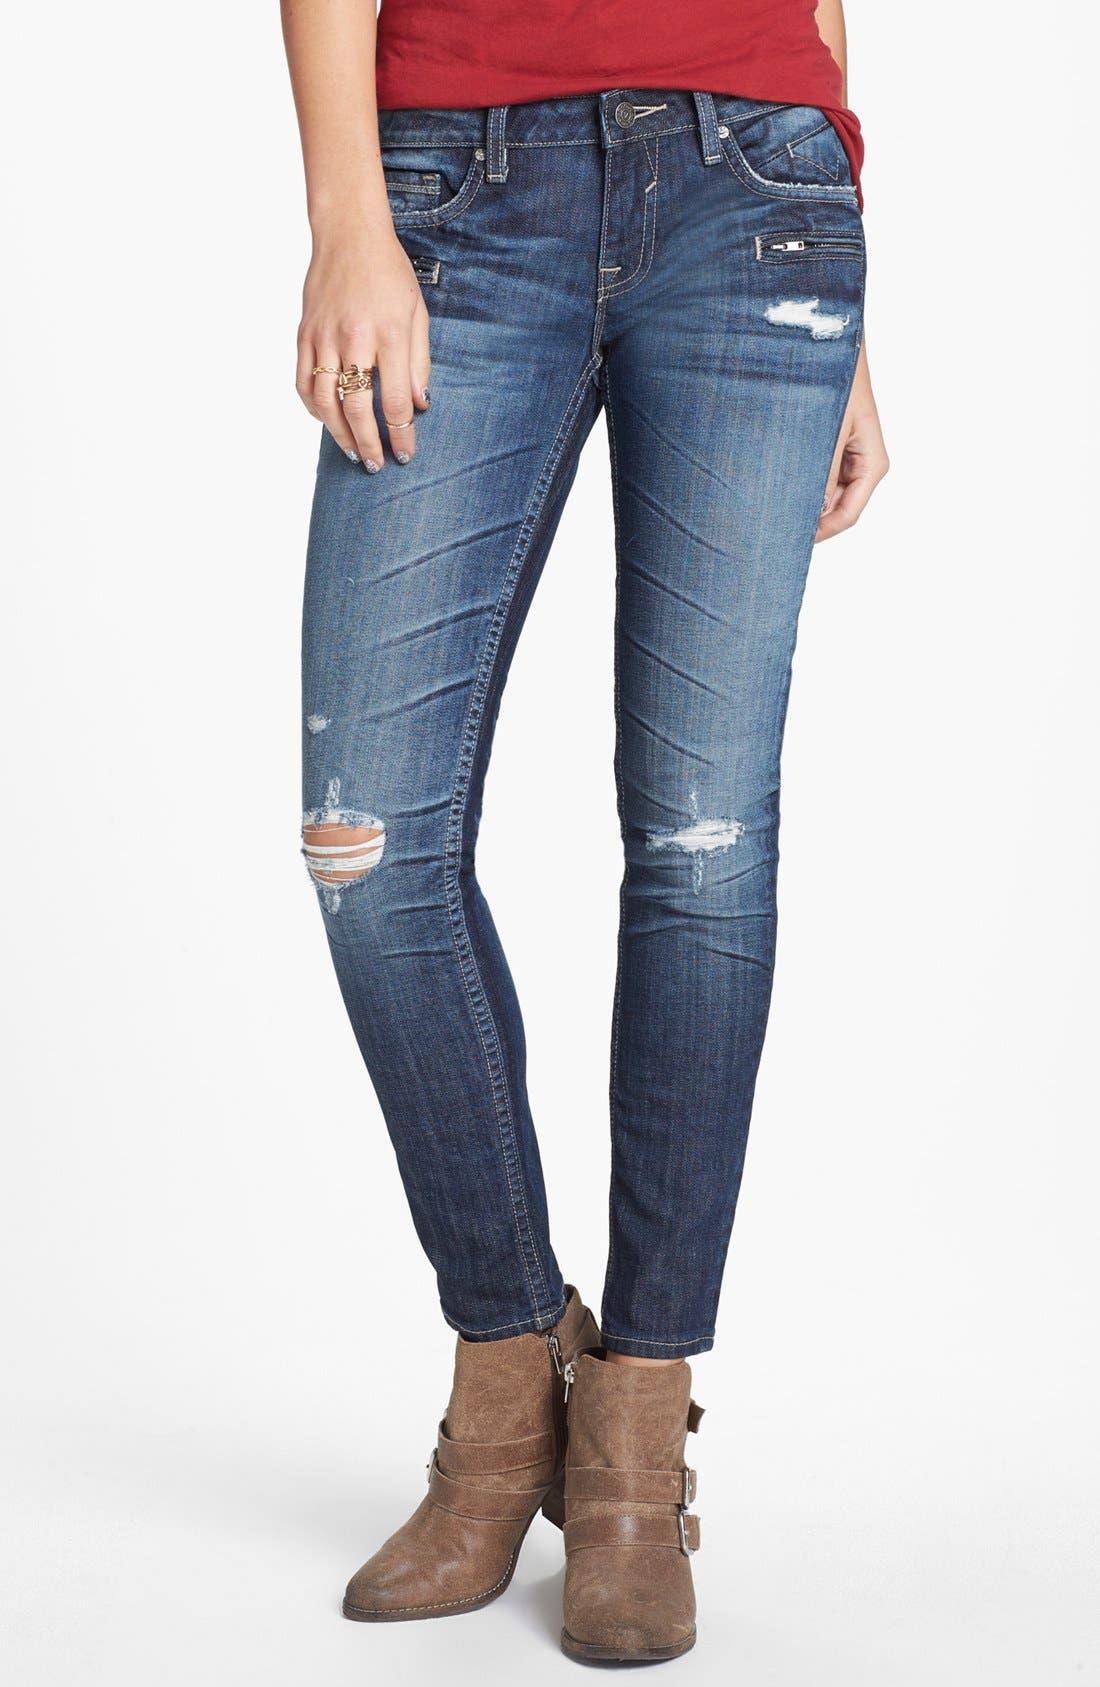 Alternate Image 1 Selected - Vigoss Deconstructed Skinny Jeans (Dark Wash) (Juniors) (Online Only)